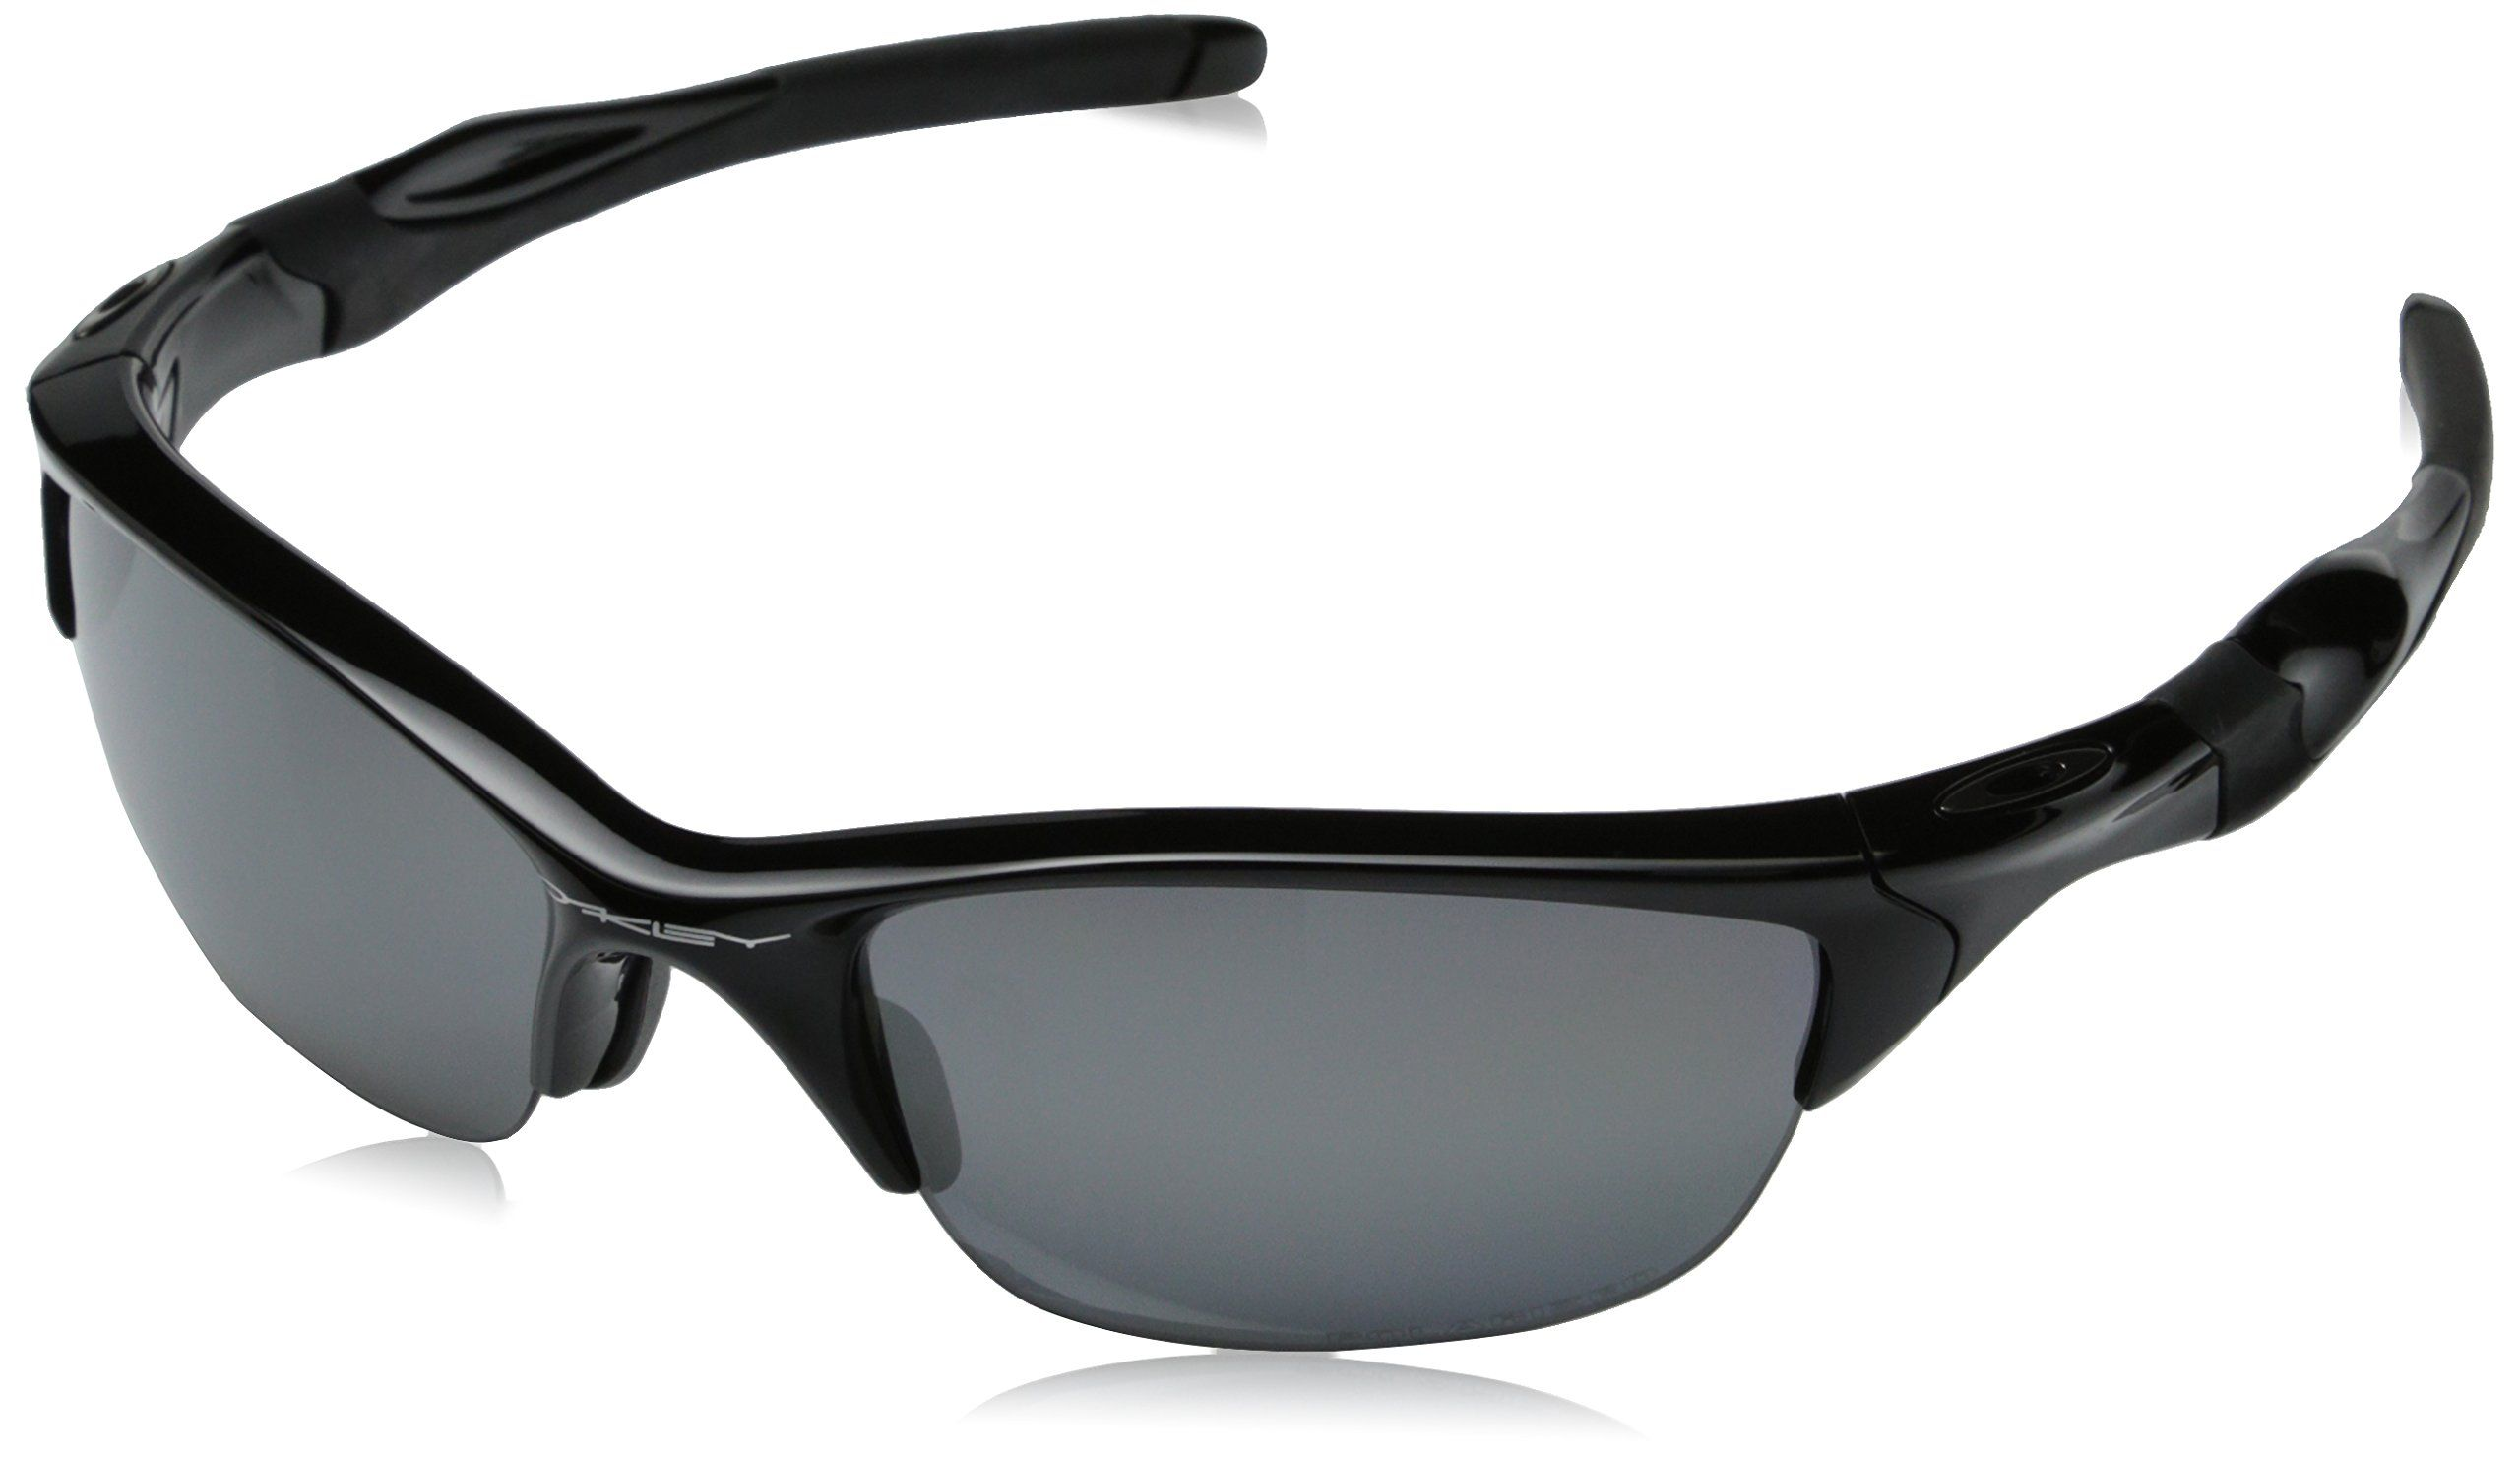 oakley men's half jacket 2.0 polarized oval sunglasses